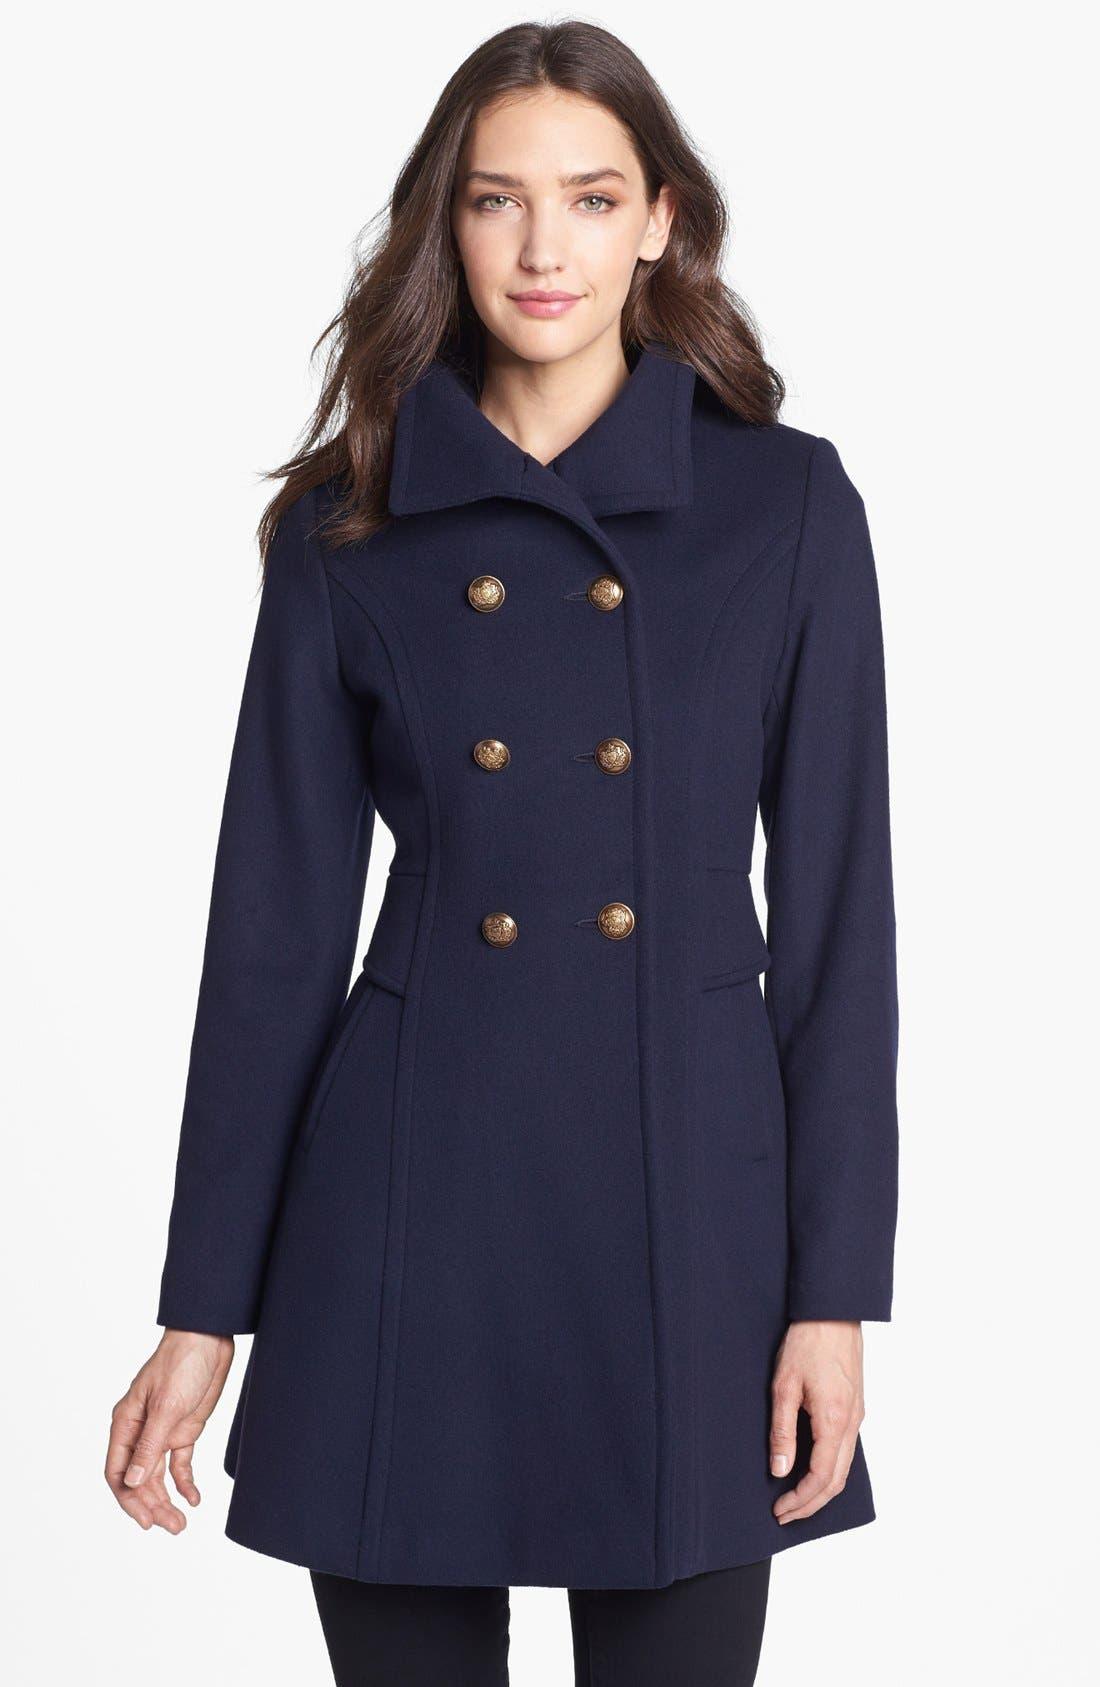 Main Image - Trina Turk Lambswool & Cashmere Officer's Coat (Petite)